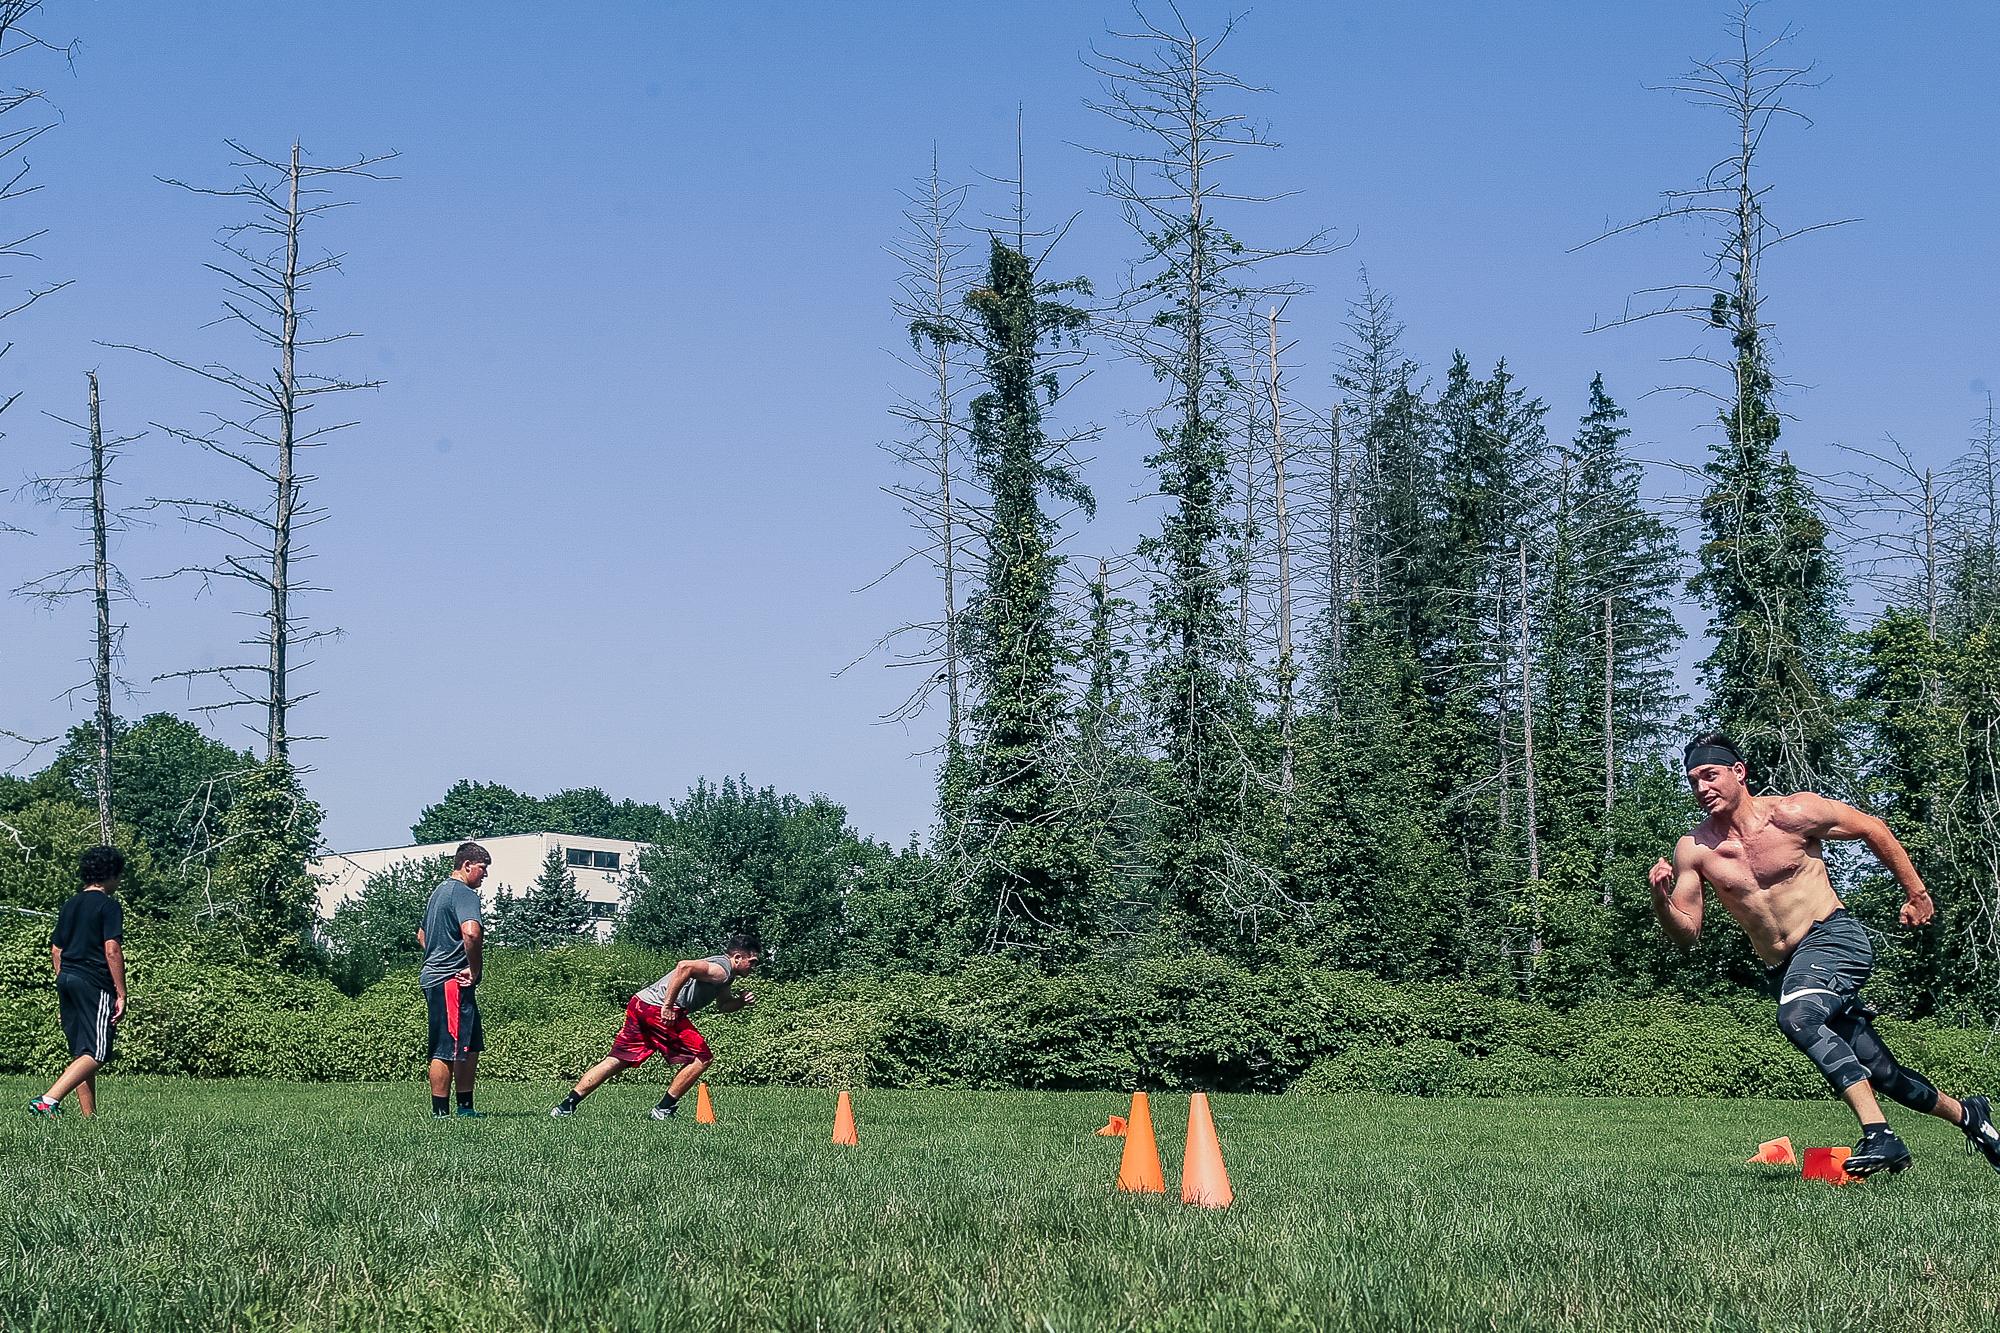 basciano-summer-training-2017-31.jpg